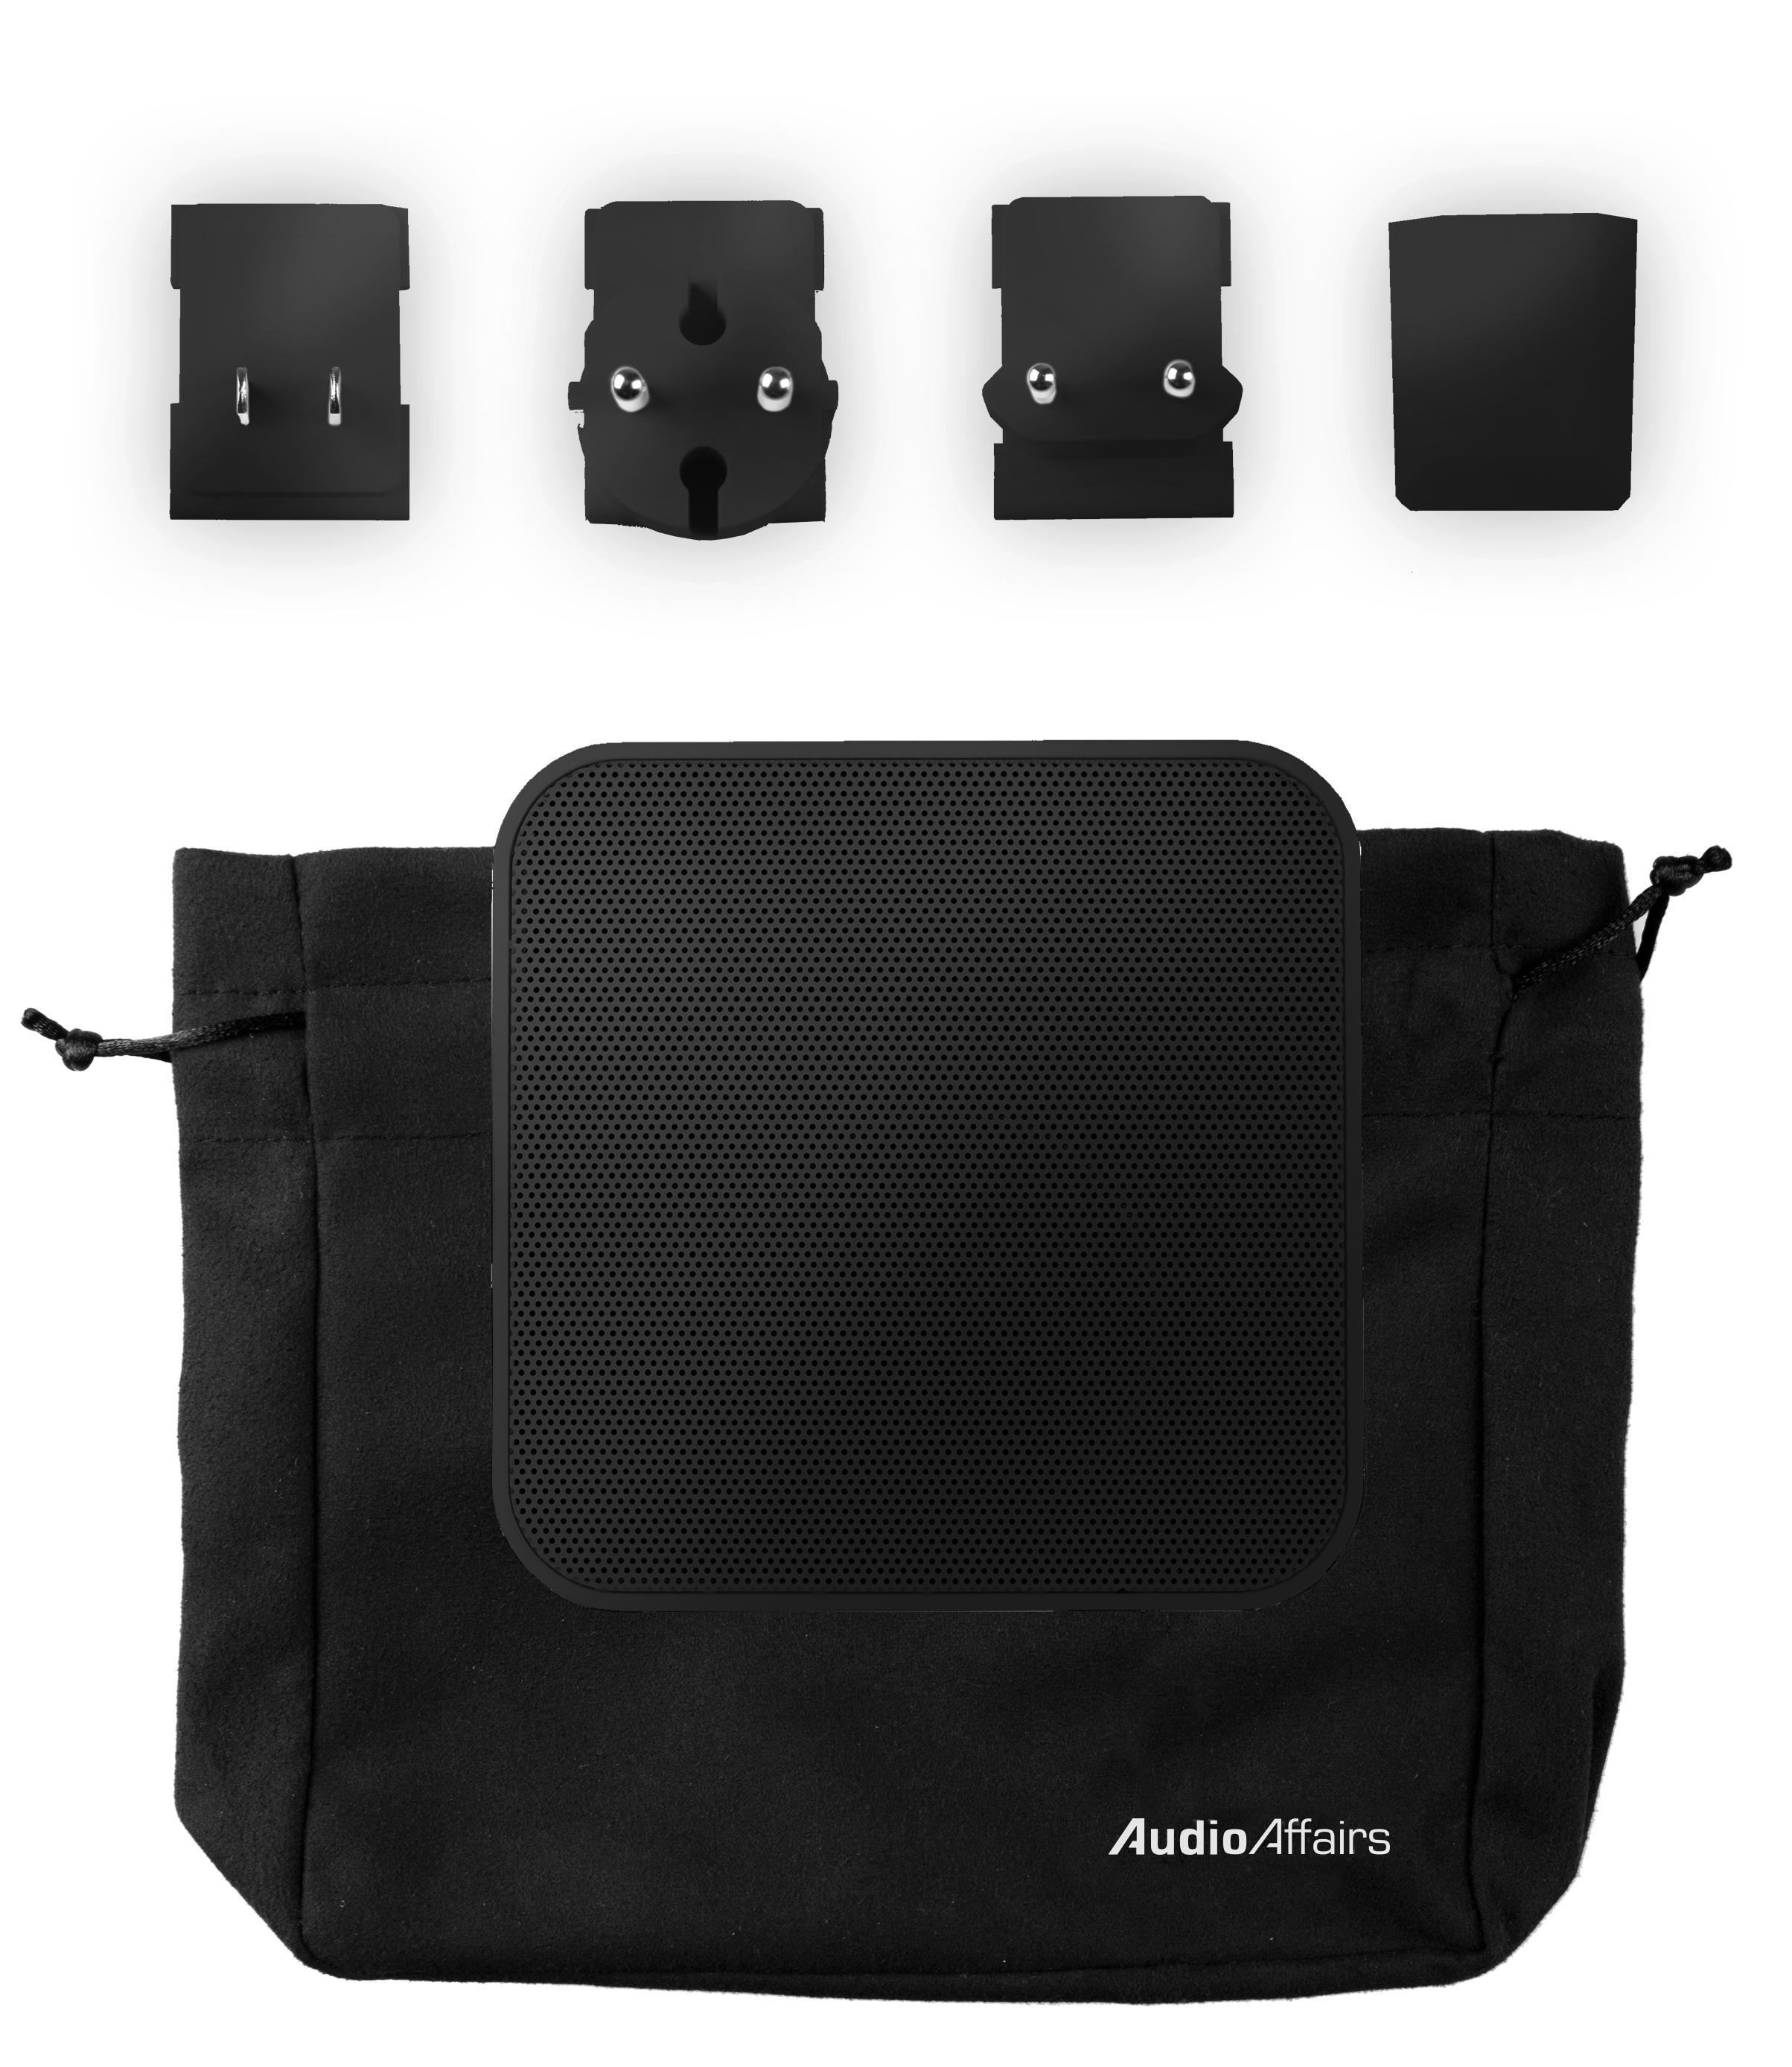 audioaffairs steckdosenradio in schwarz plug radio inkl. Black Bedroom Furniture Sets. Home Design Ideas